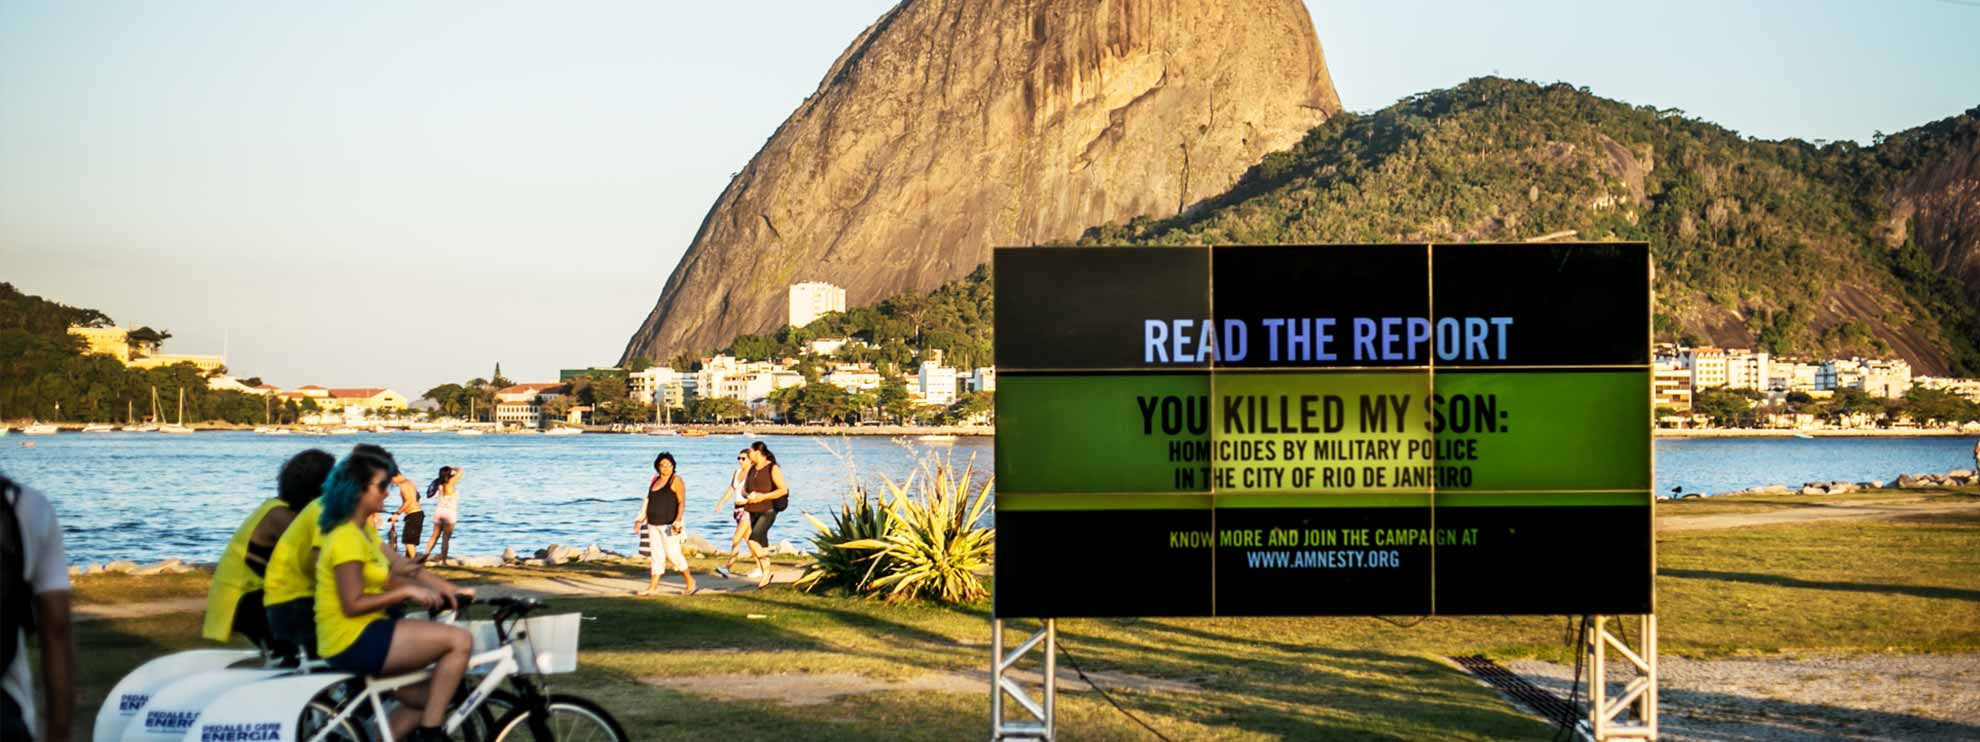 Aktion zur Veröffentlichung des AI-Berichtes «You killed my son - Homicides by military police in the city of Rio de Janeiro» © Thiago Dezan/ Amnistia Internacional Brasil